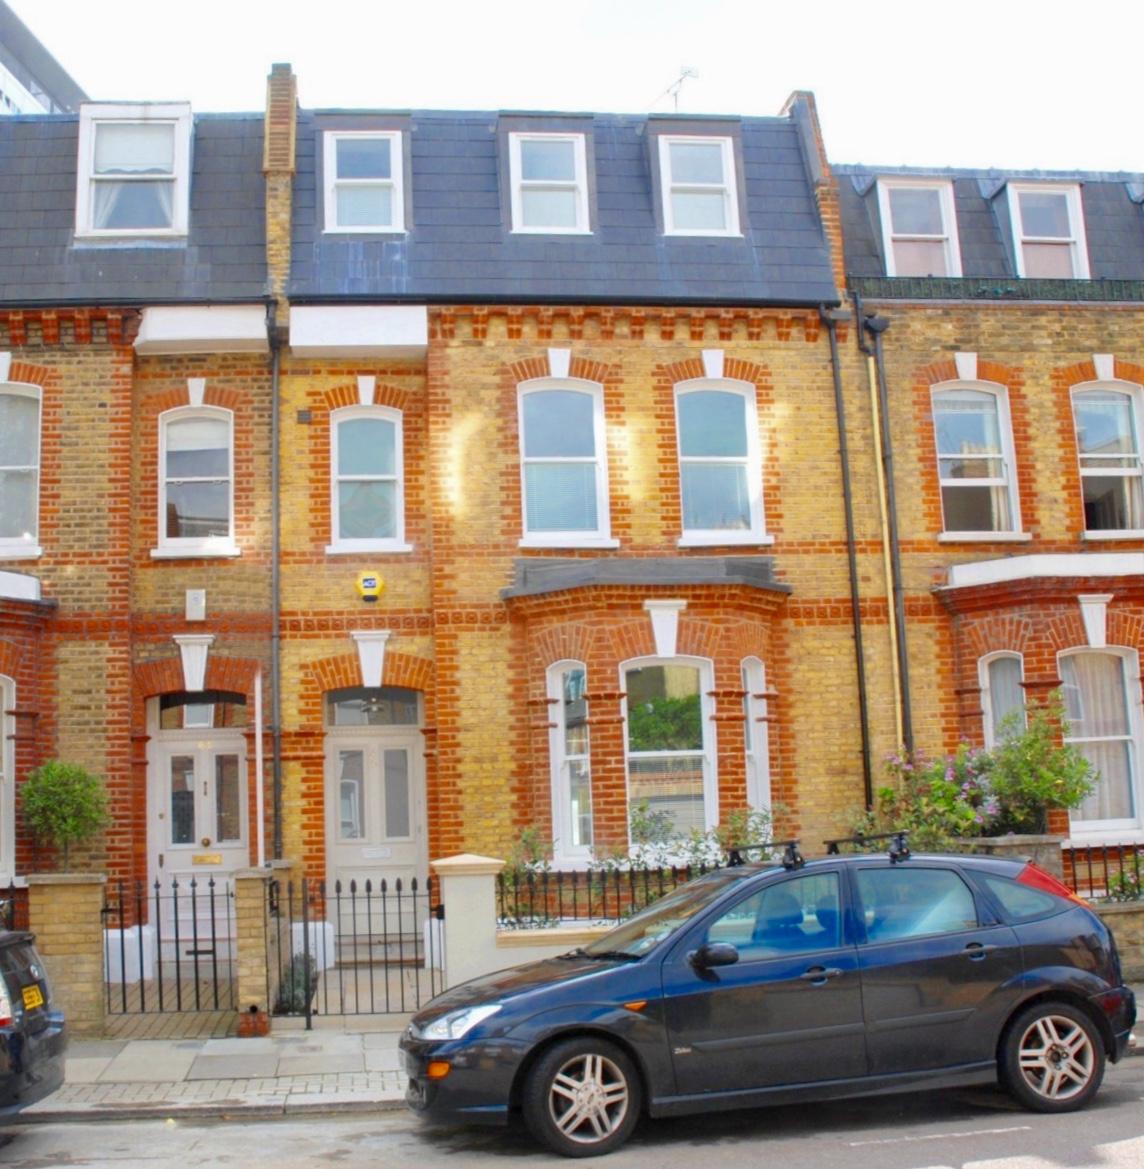 House refurb, Battersea